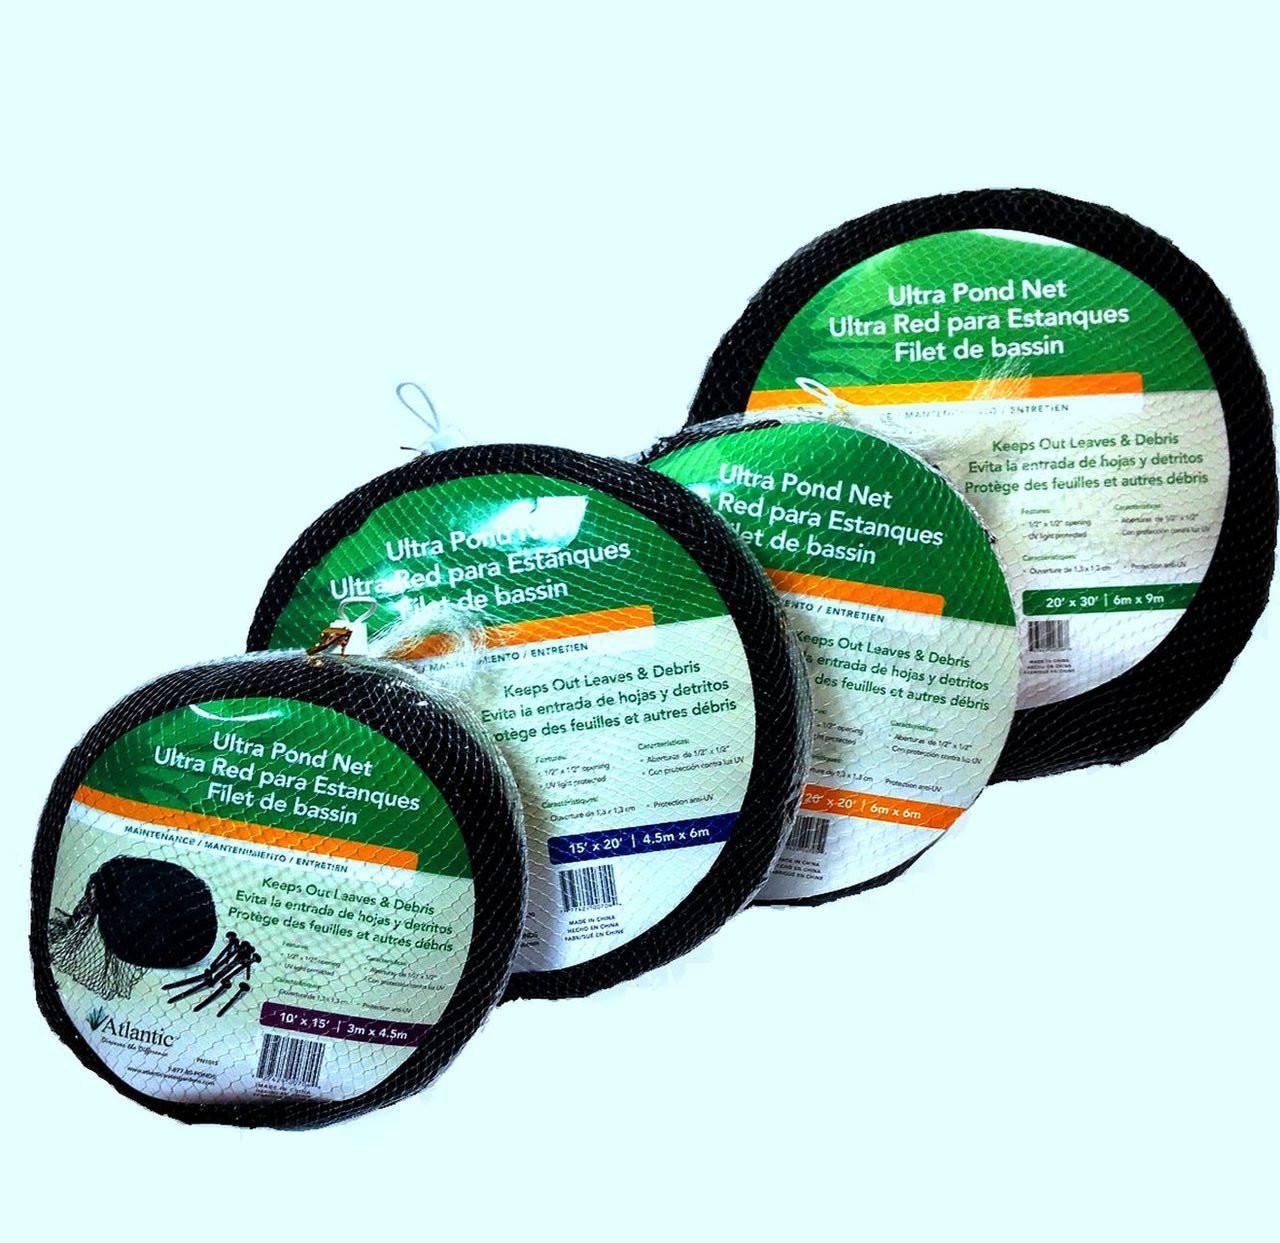 Atlantic ultra pond net pond accessories for Garden pool netting